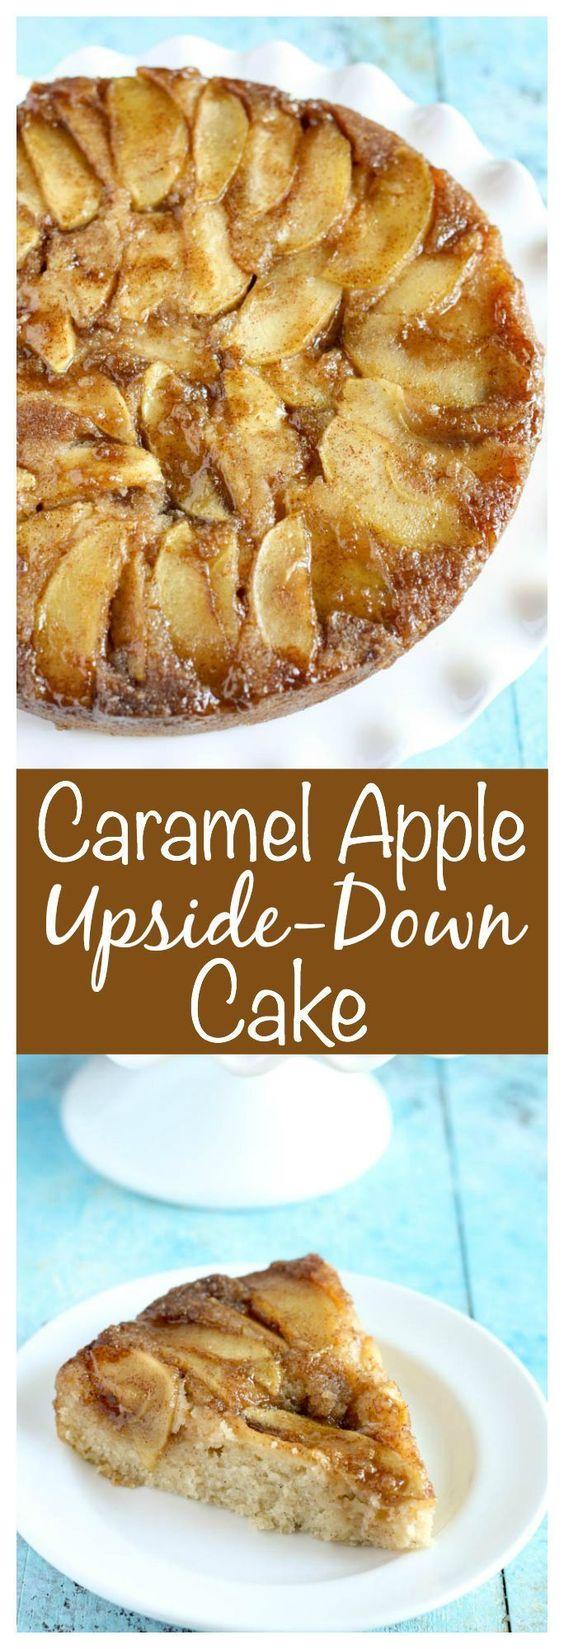 Caramel Apple Upside-Down Cake   Recipe   Caramel apples, Apple cakes ...